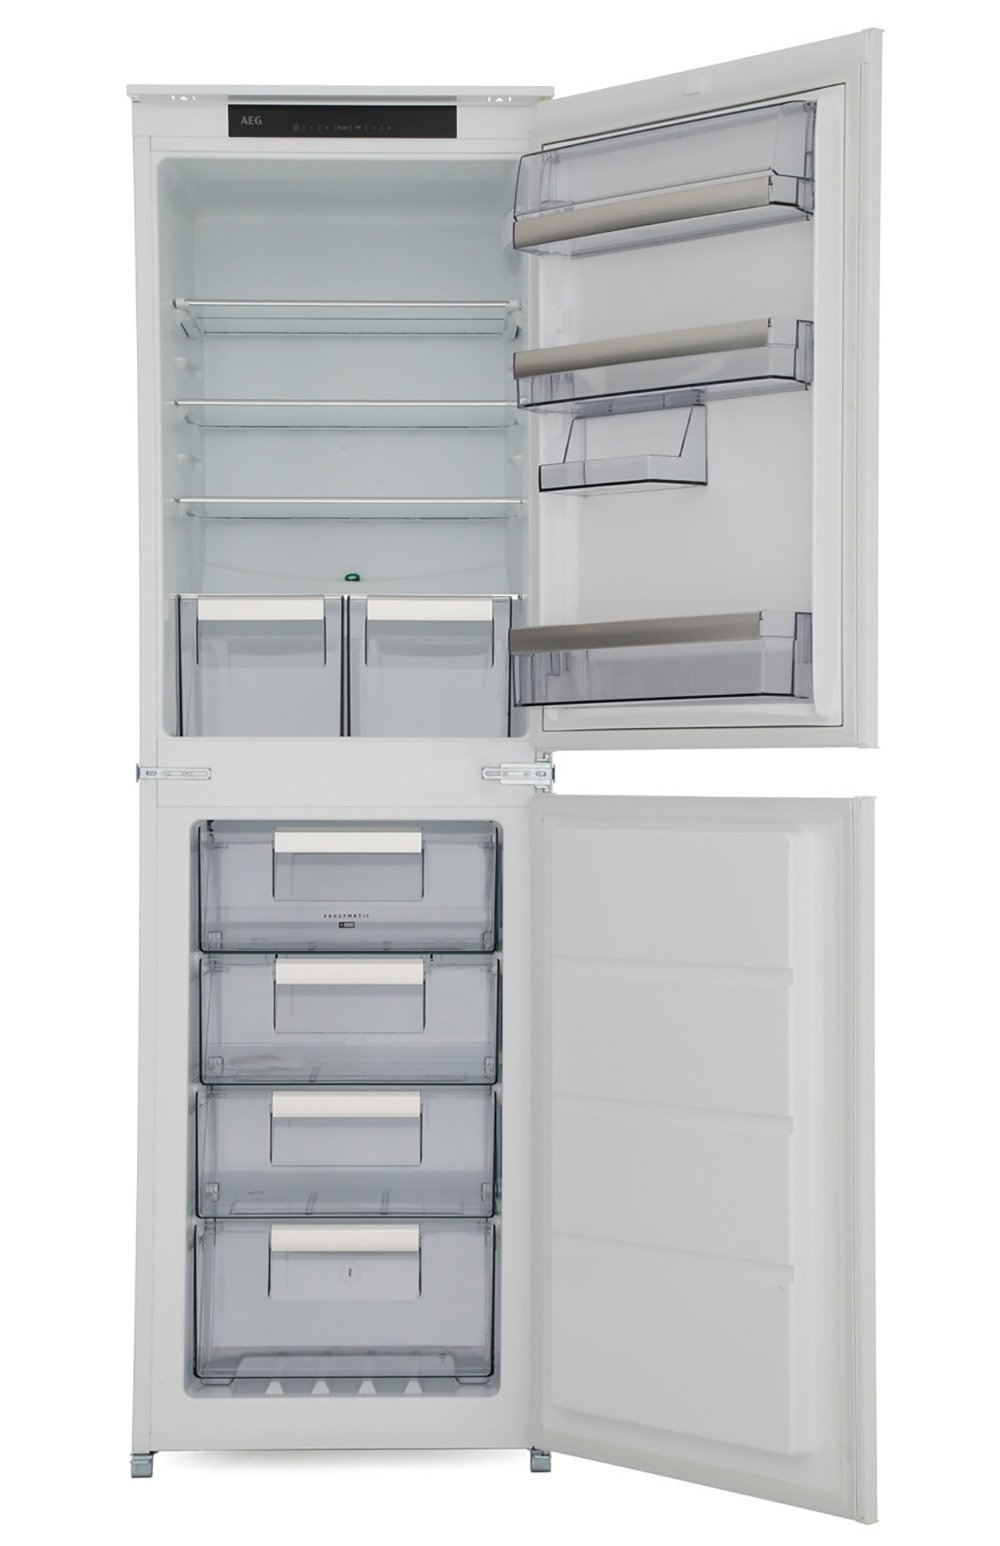 AEG SCE8181VNS Frost Free Integrated Fridge Freezer